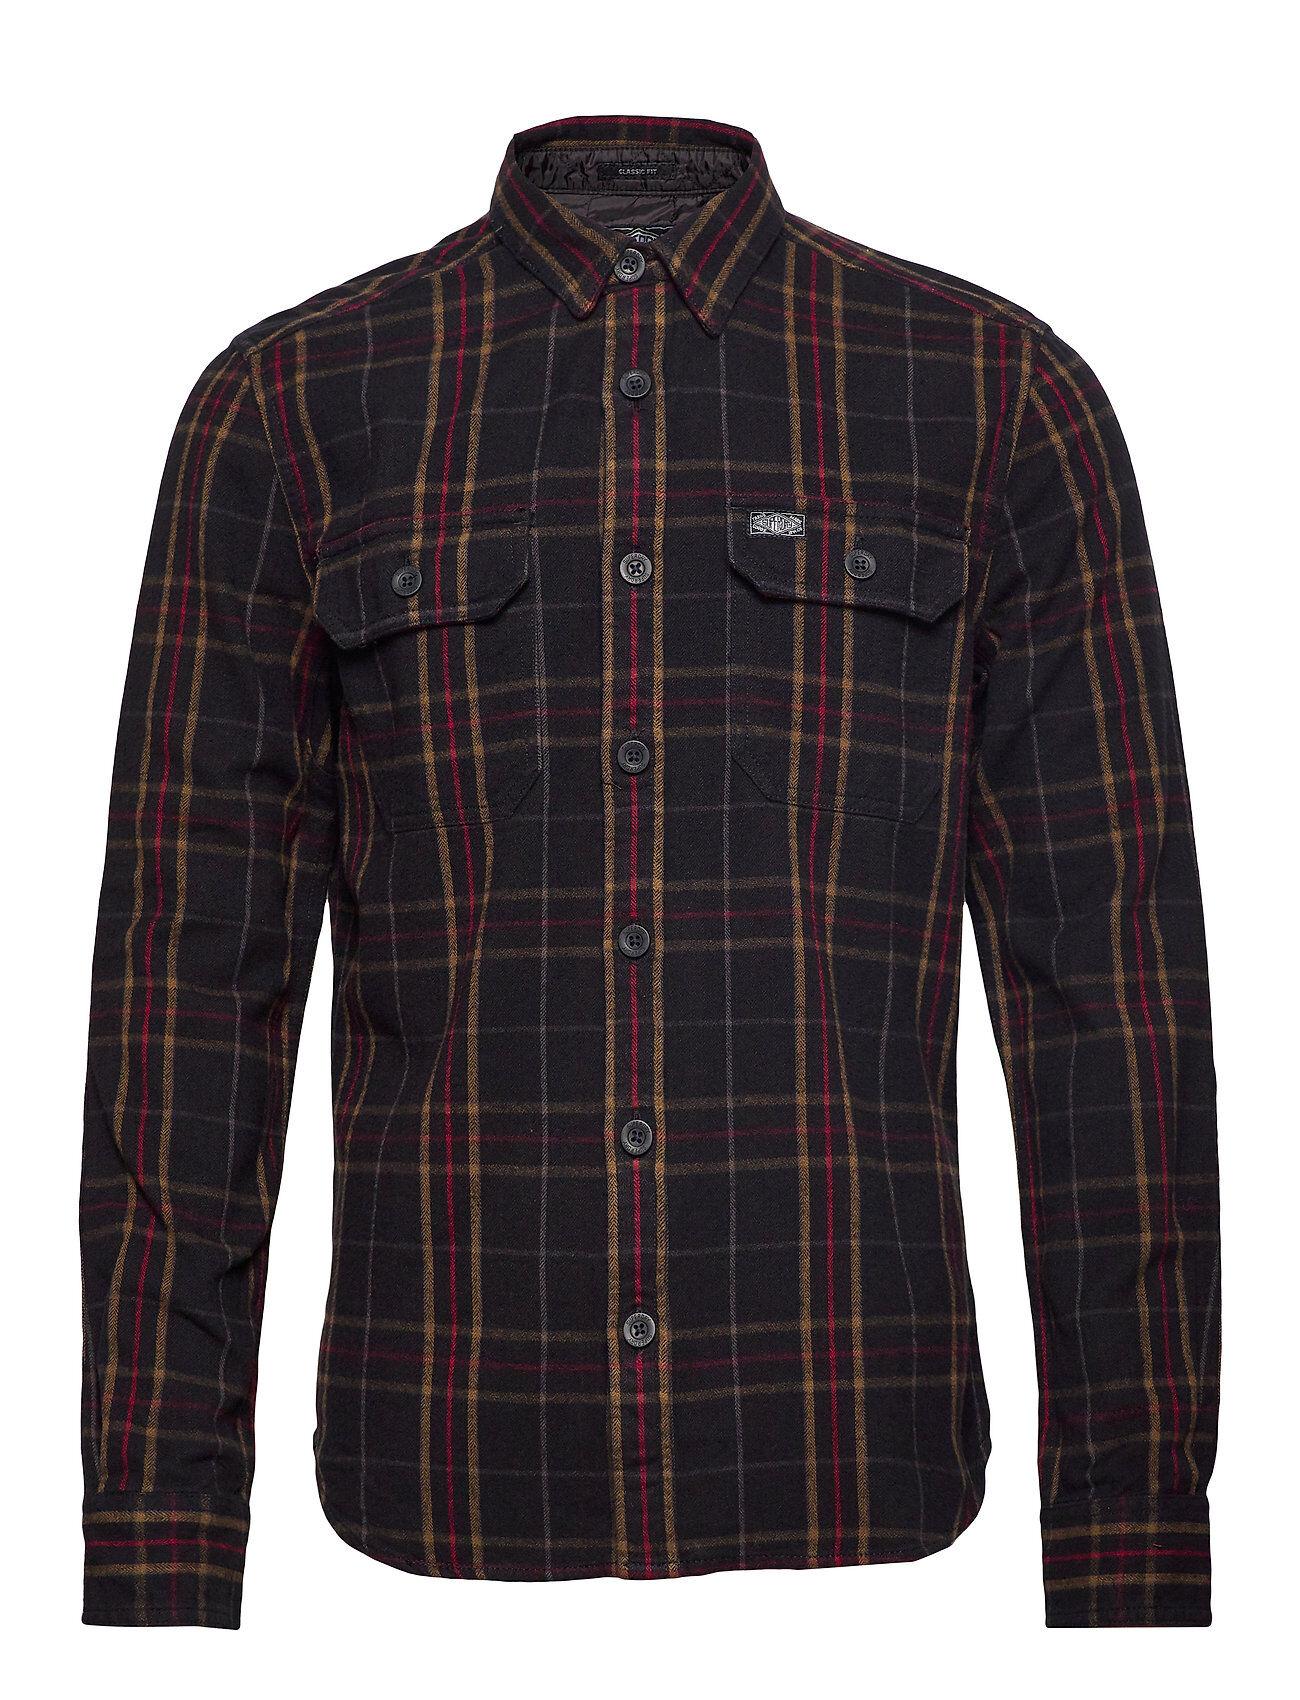 Superdry Merchant Milled L/S Shirt Paita Rento Casual Monivärinen/Kuvioitu Superdry